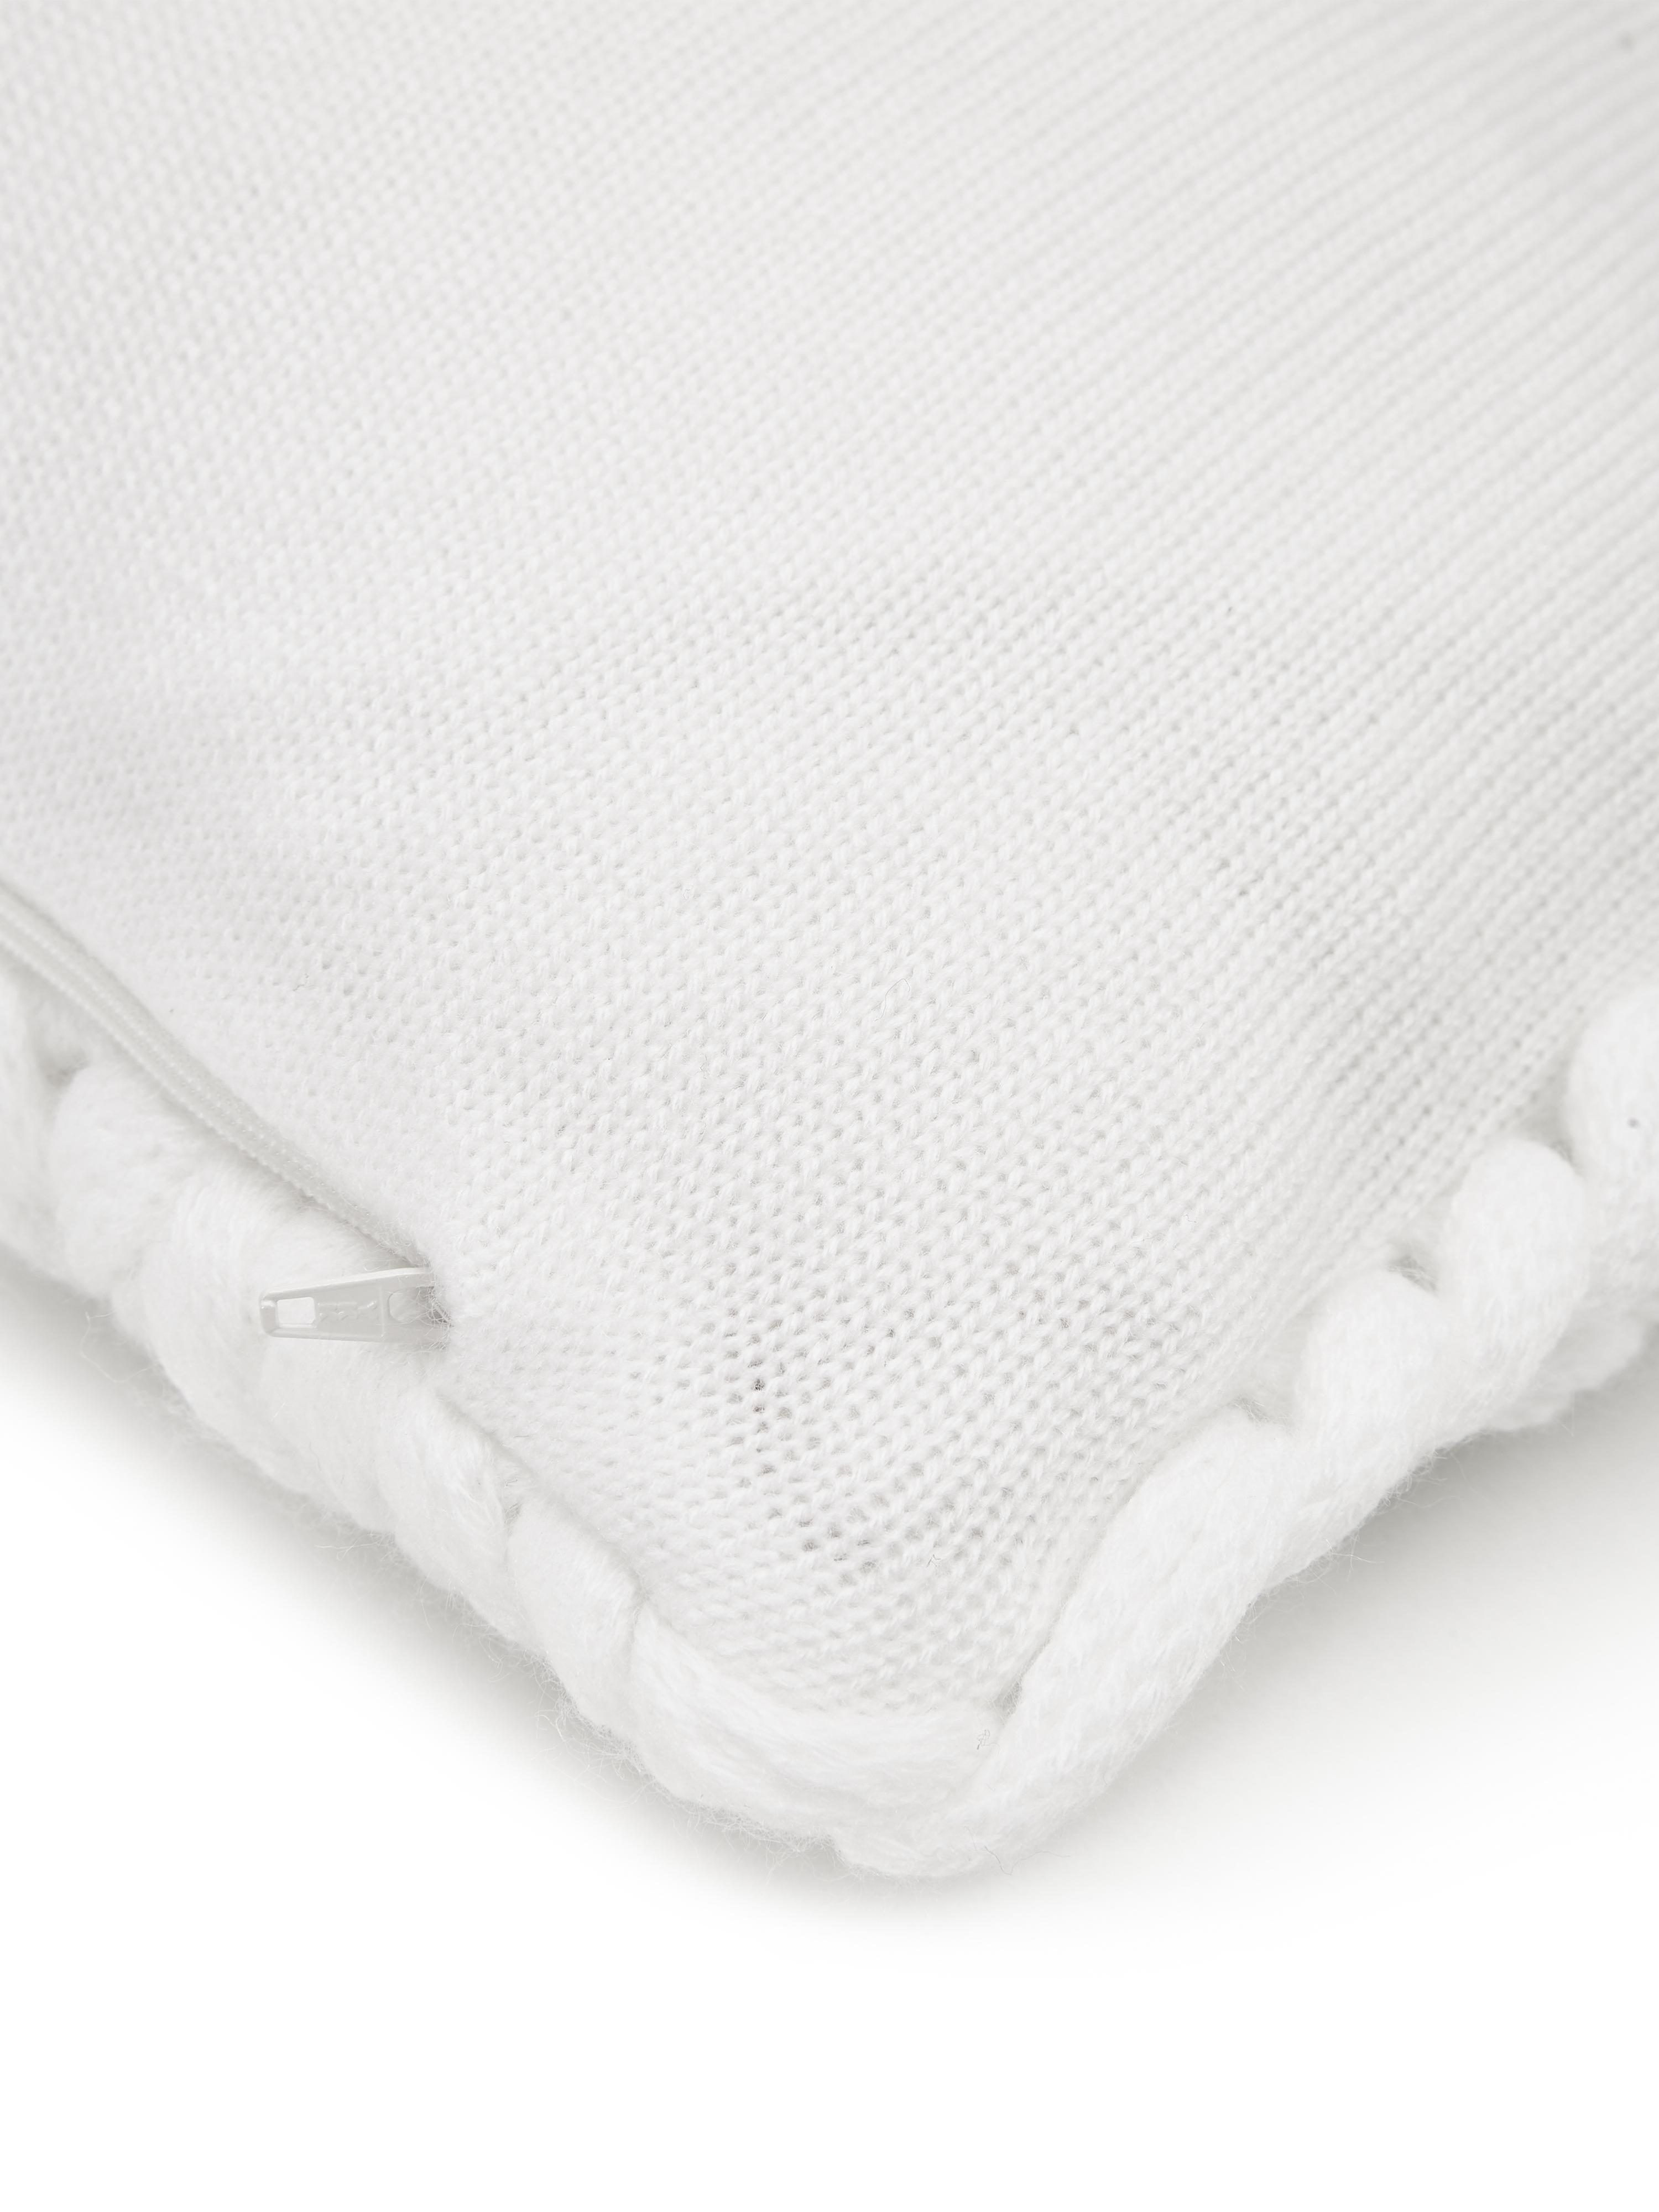 Grofgebreide kussenhoes Adyna in wit, 100% polyacryl, Crèmewit, 45 x 45 cm